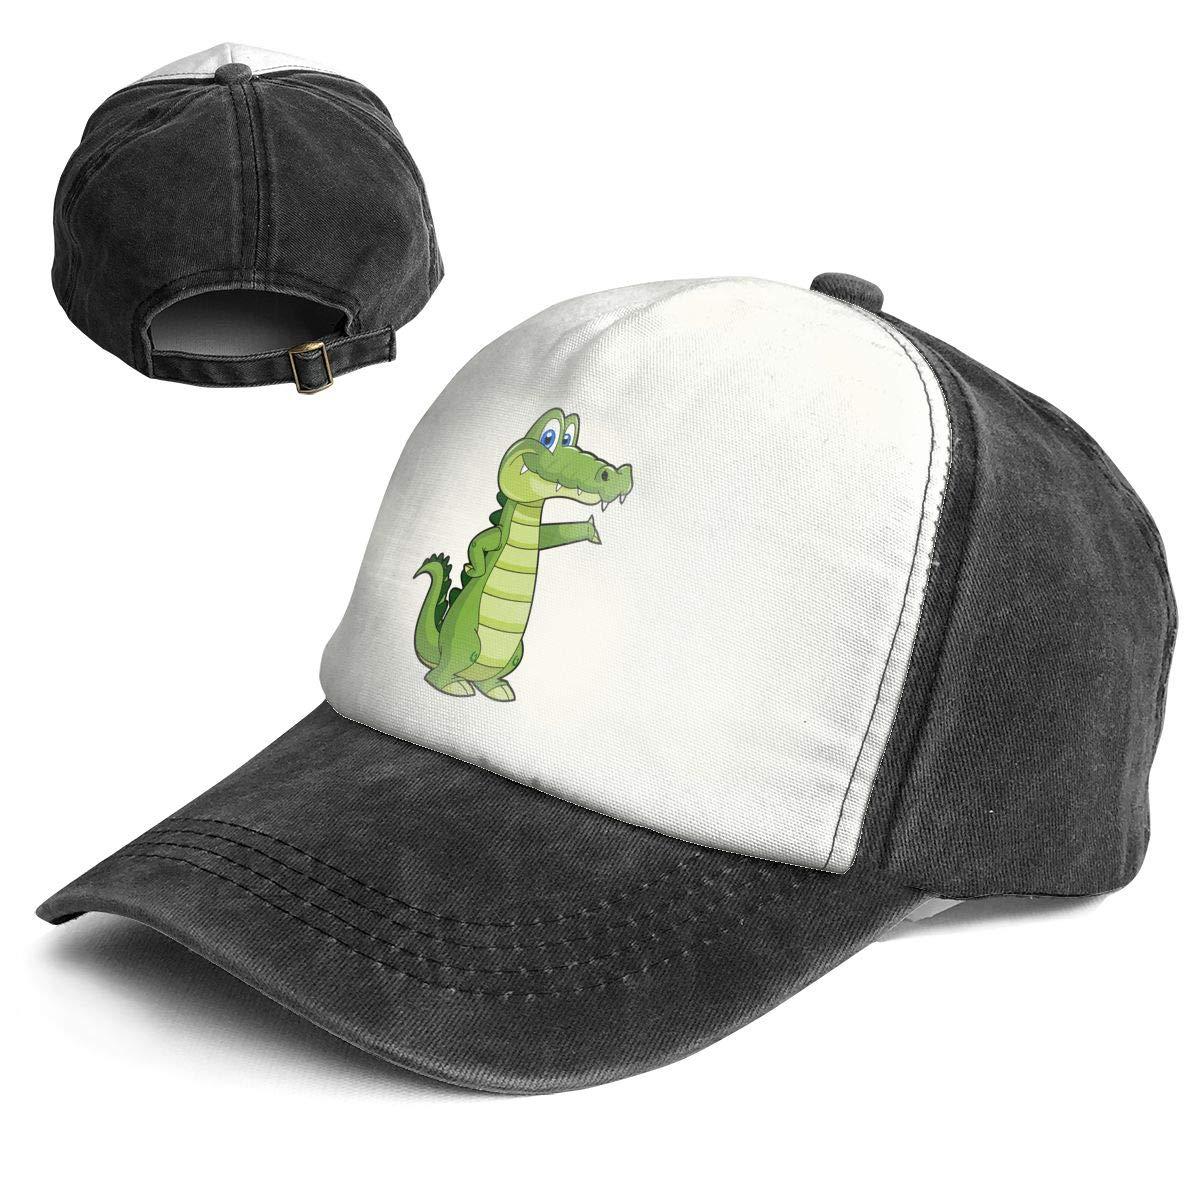 08ef78637fd Amazon.com: QZDLq Fashion Vintage Hat Baby Crocodile Cartoon ...